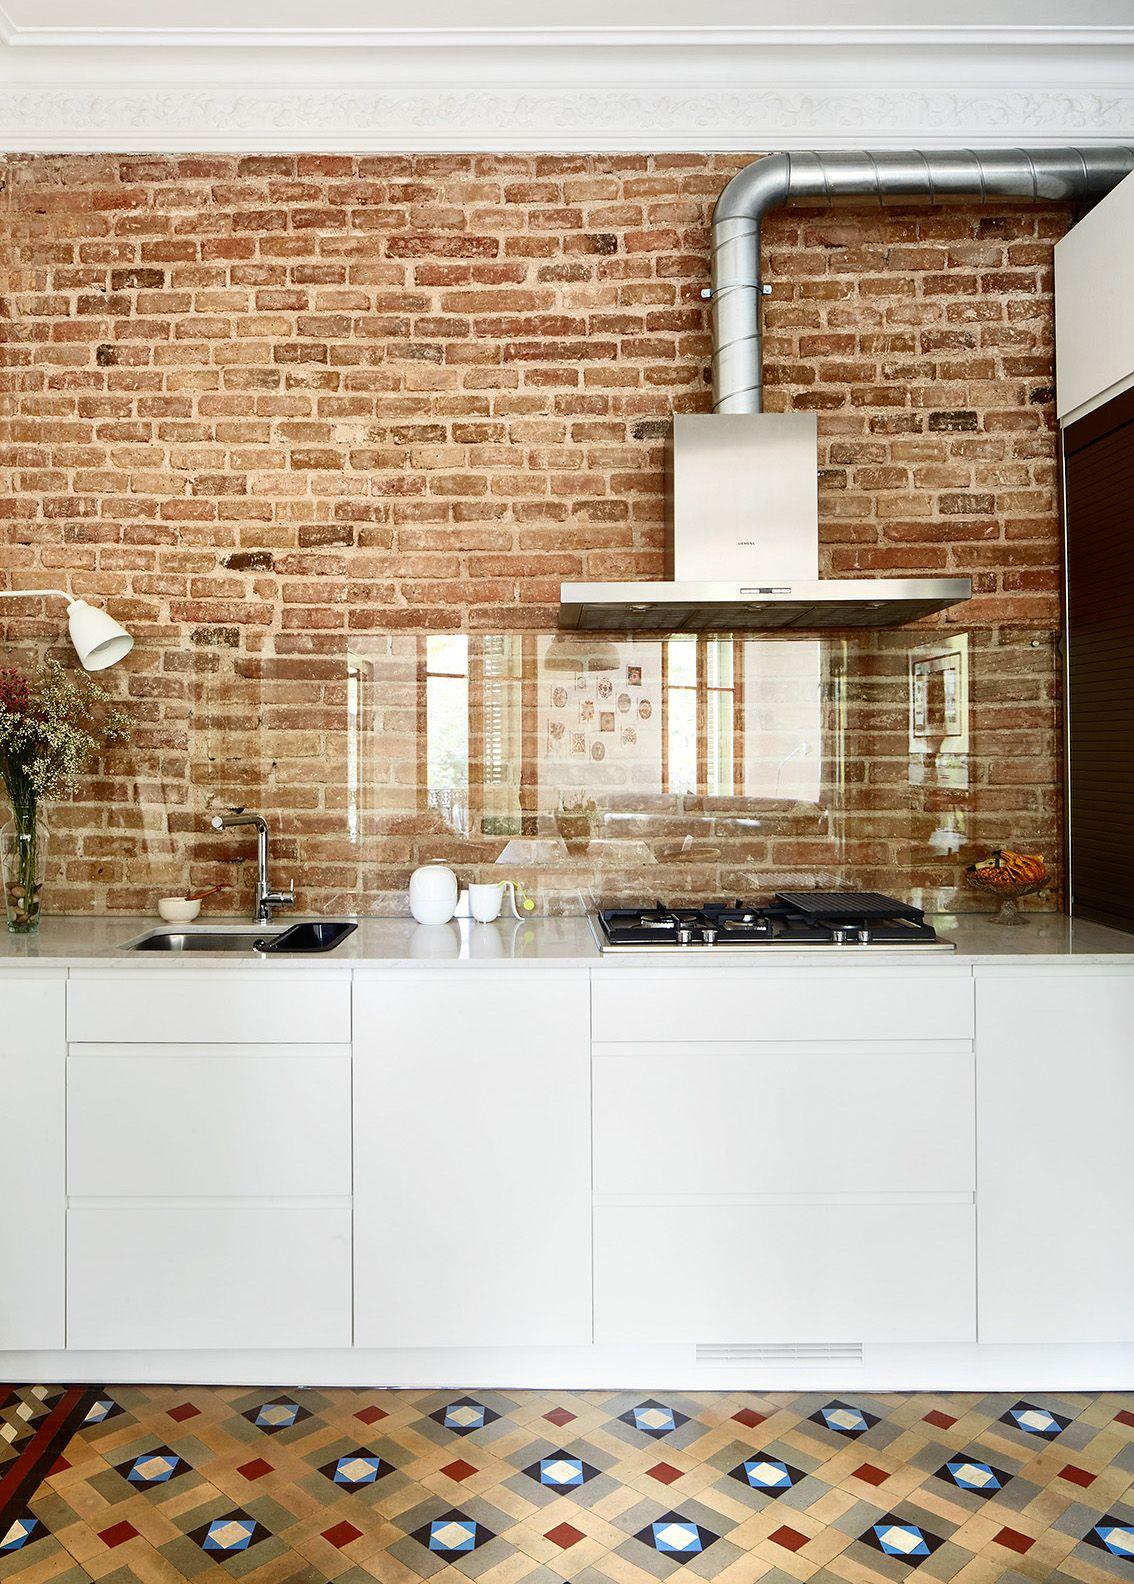 cocina con frente de vidrio - Construcción en seco: ideas para ...